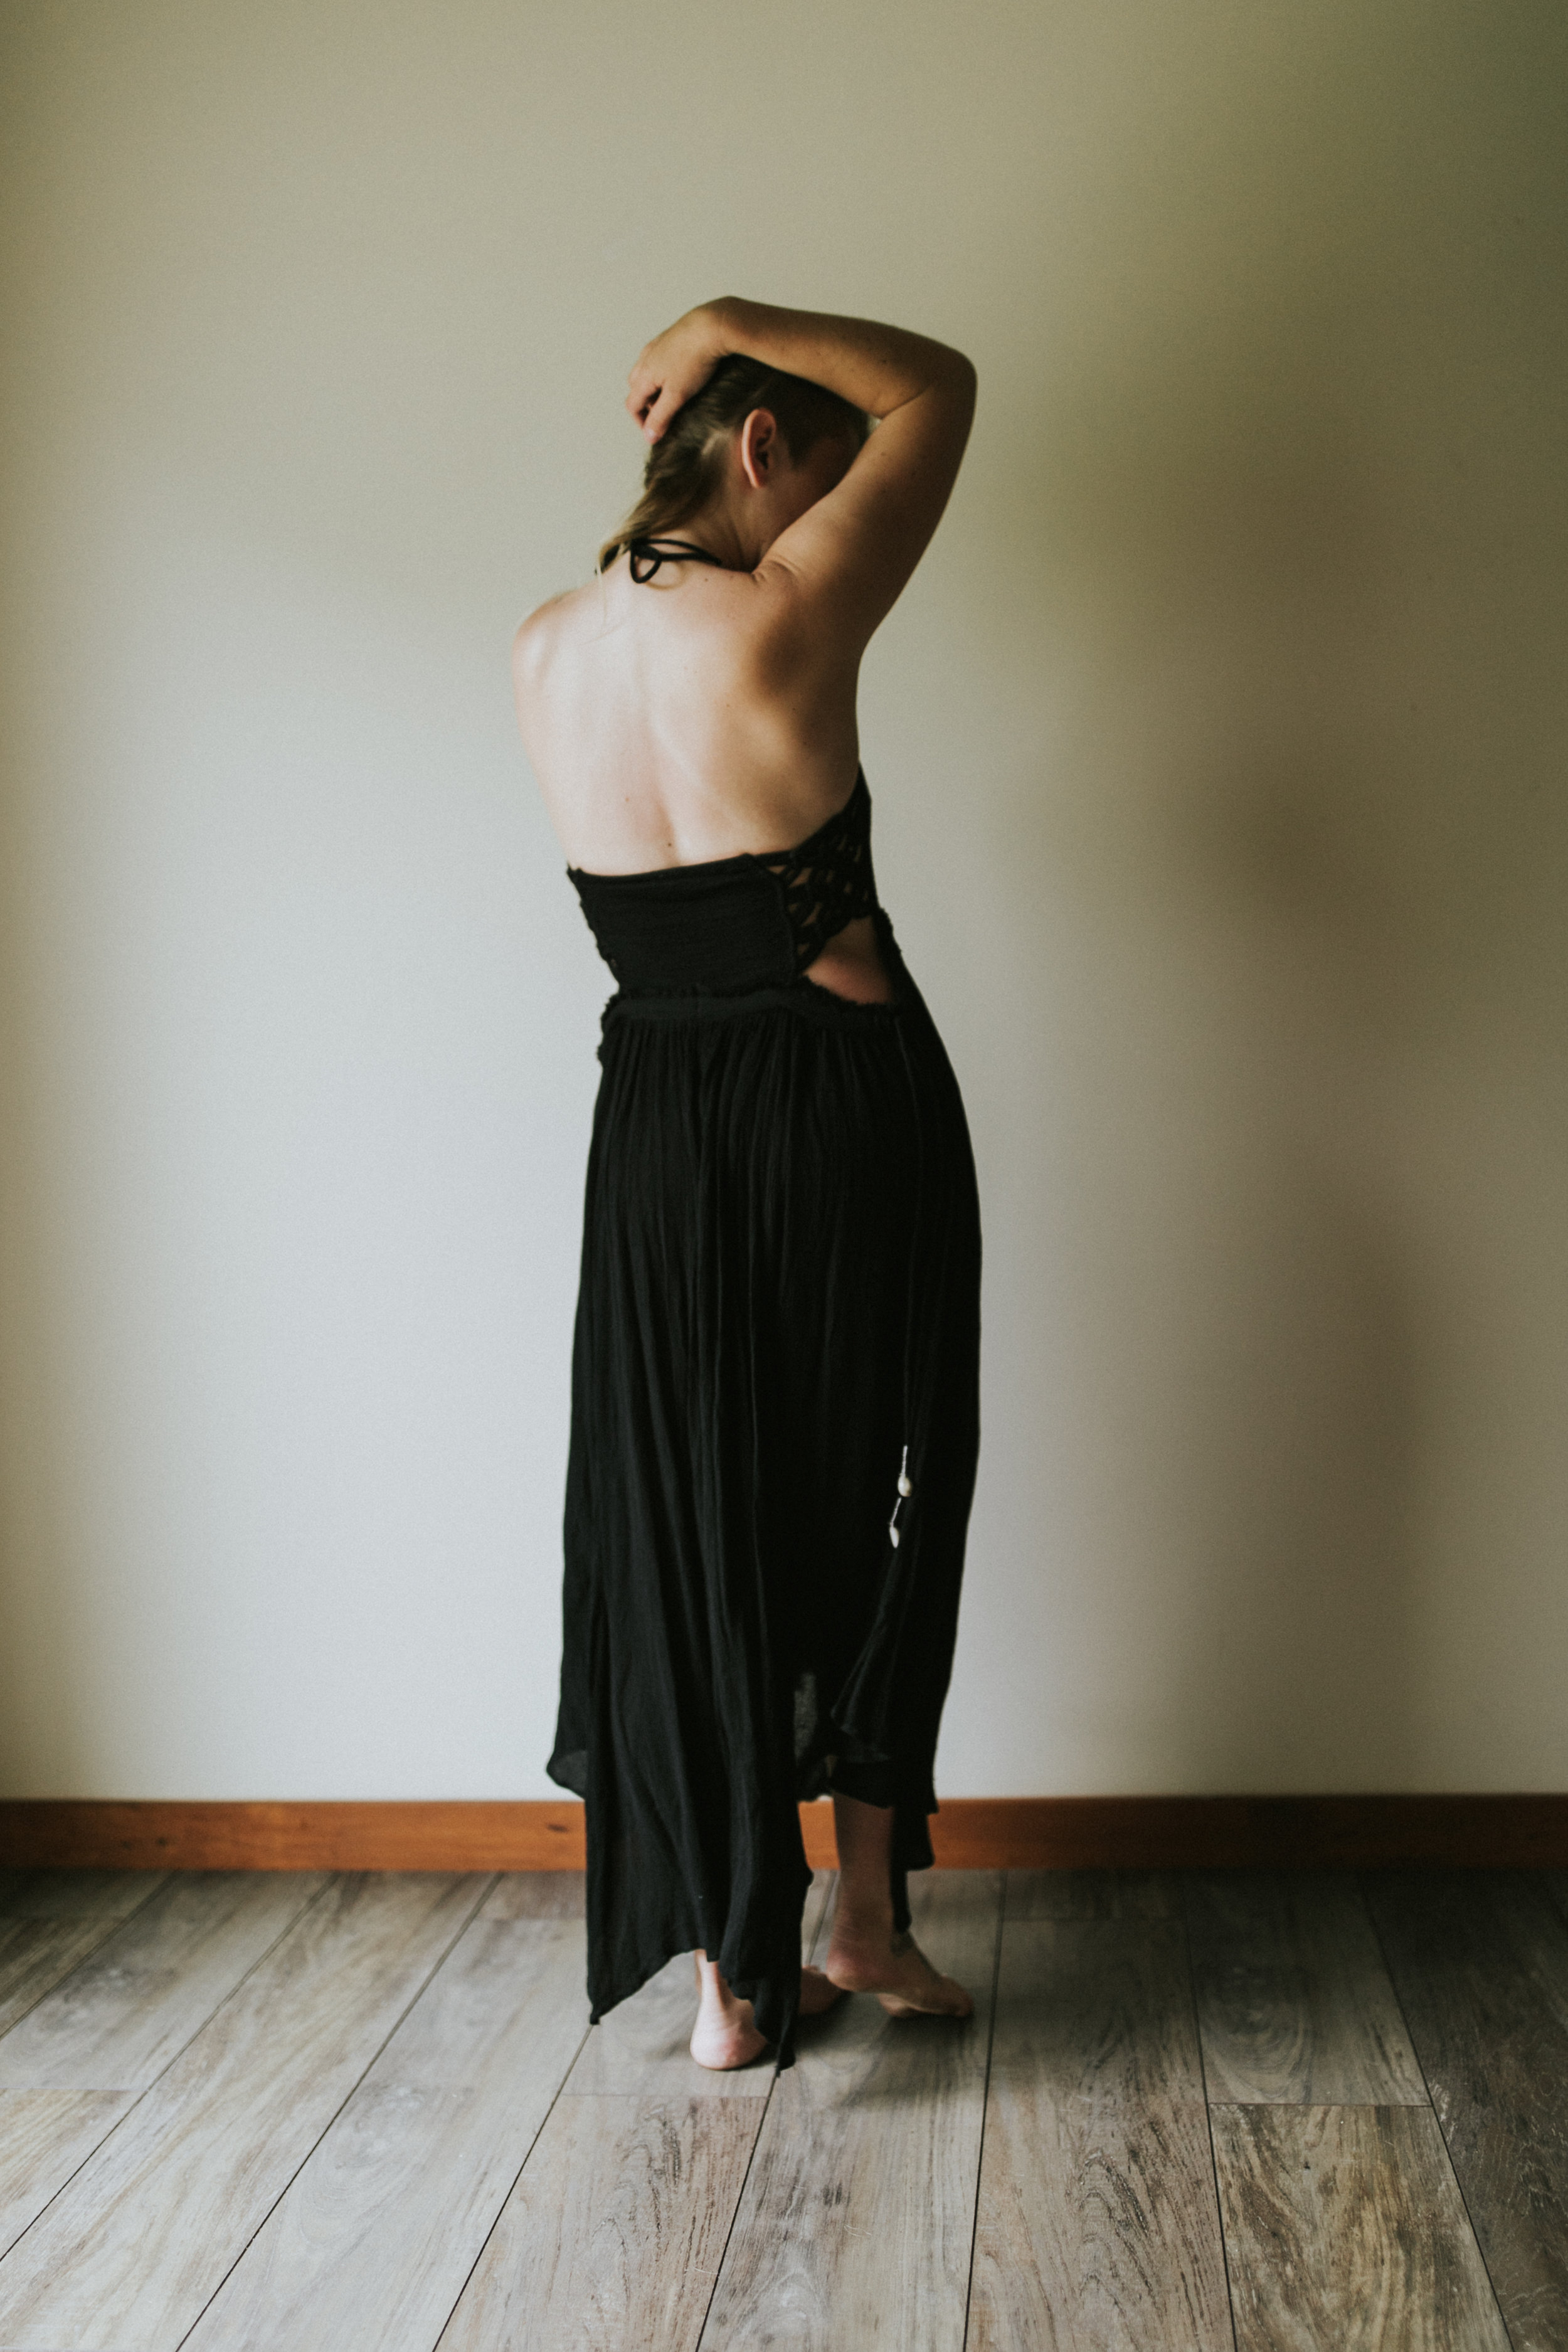 michigan-lifestyle-photographer-jessica-max-071.jpg